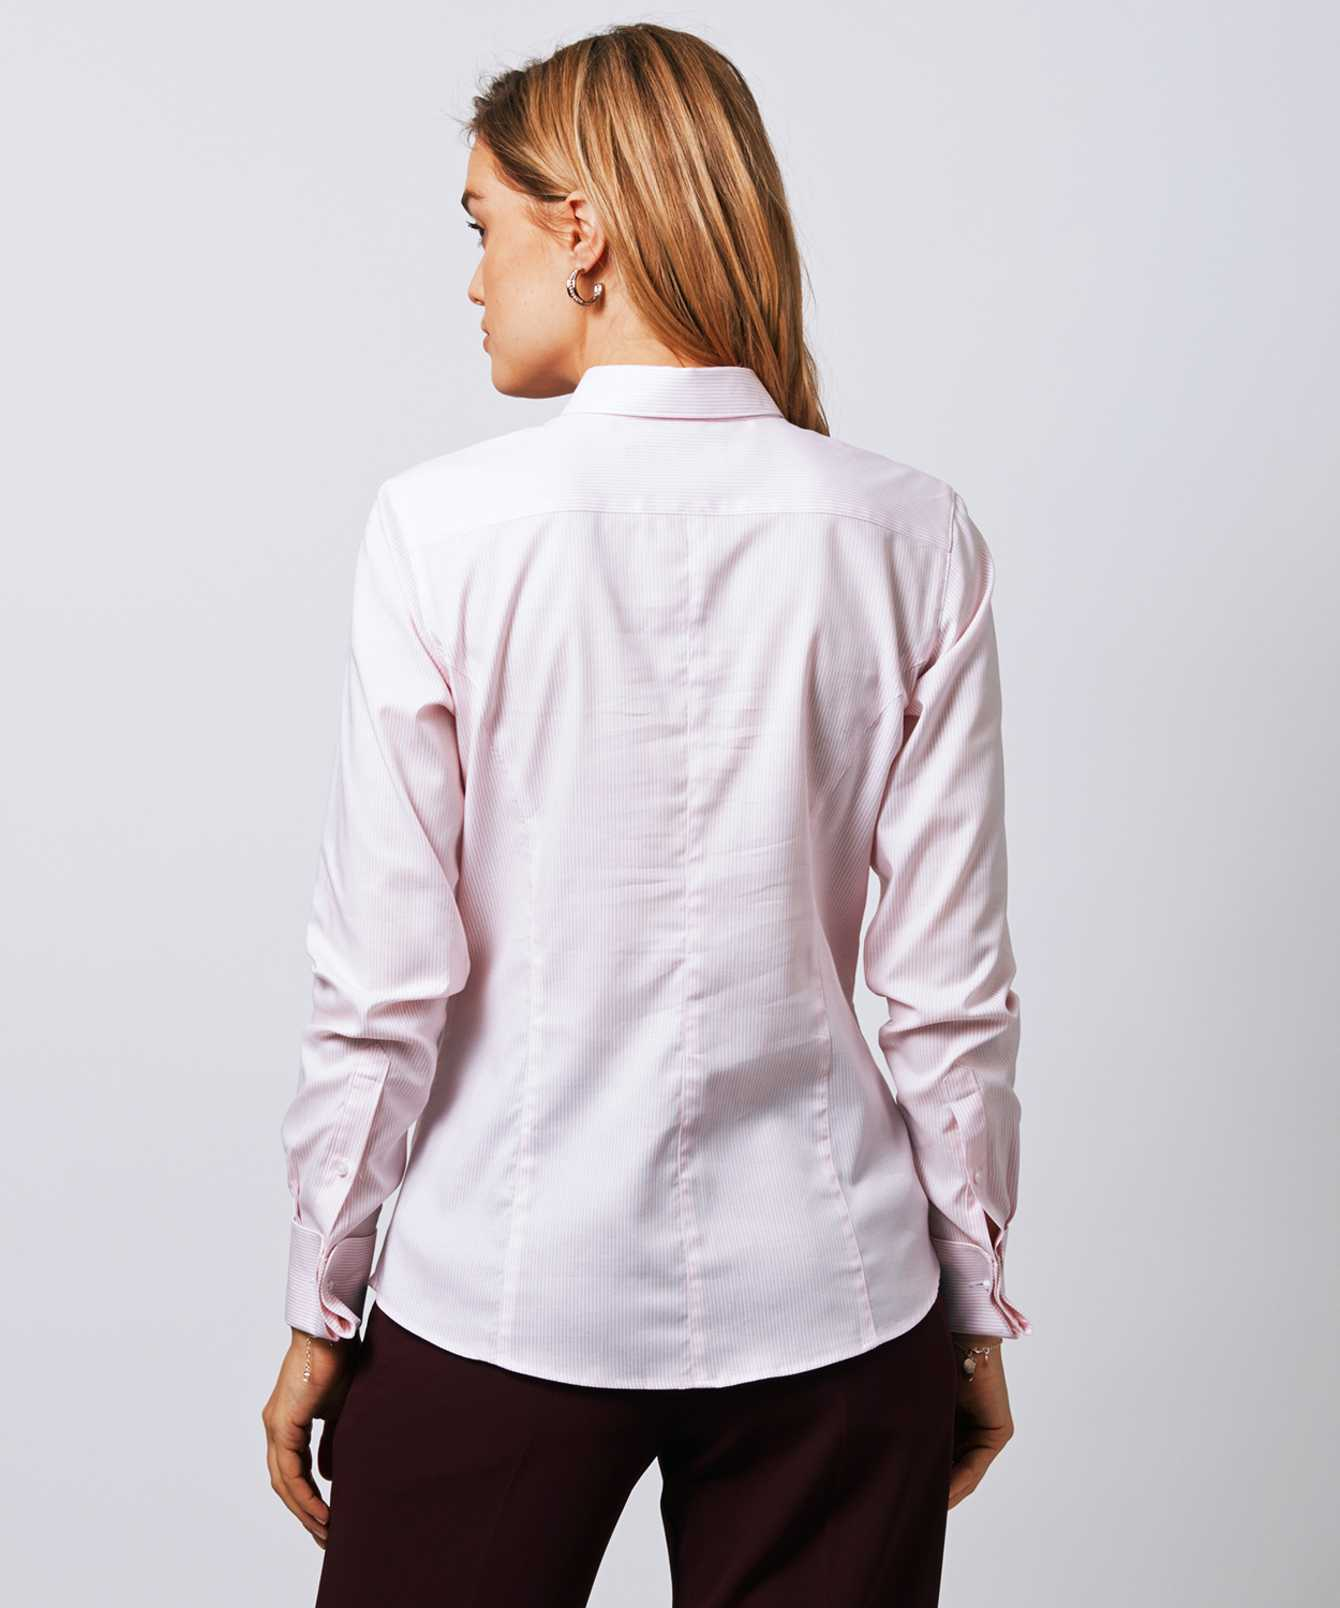 Shirt Emma Lynwood The Shirt Factory